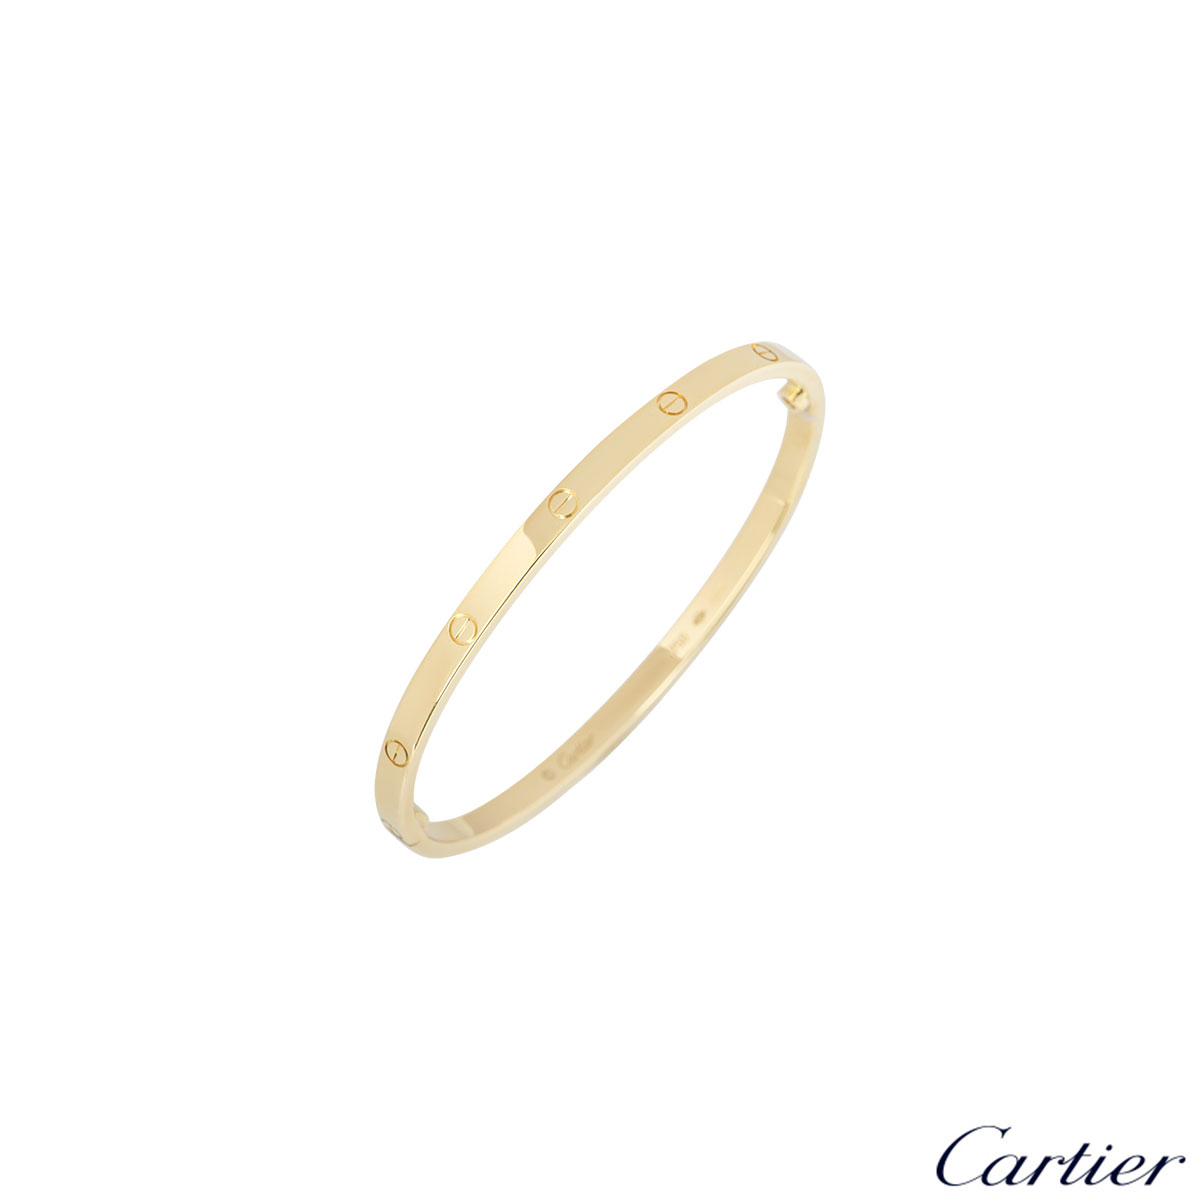 Cartier Yellow Gold Plain Love Bracelet SM Size 19 B6047519